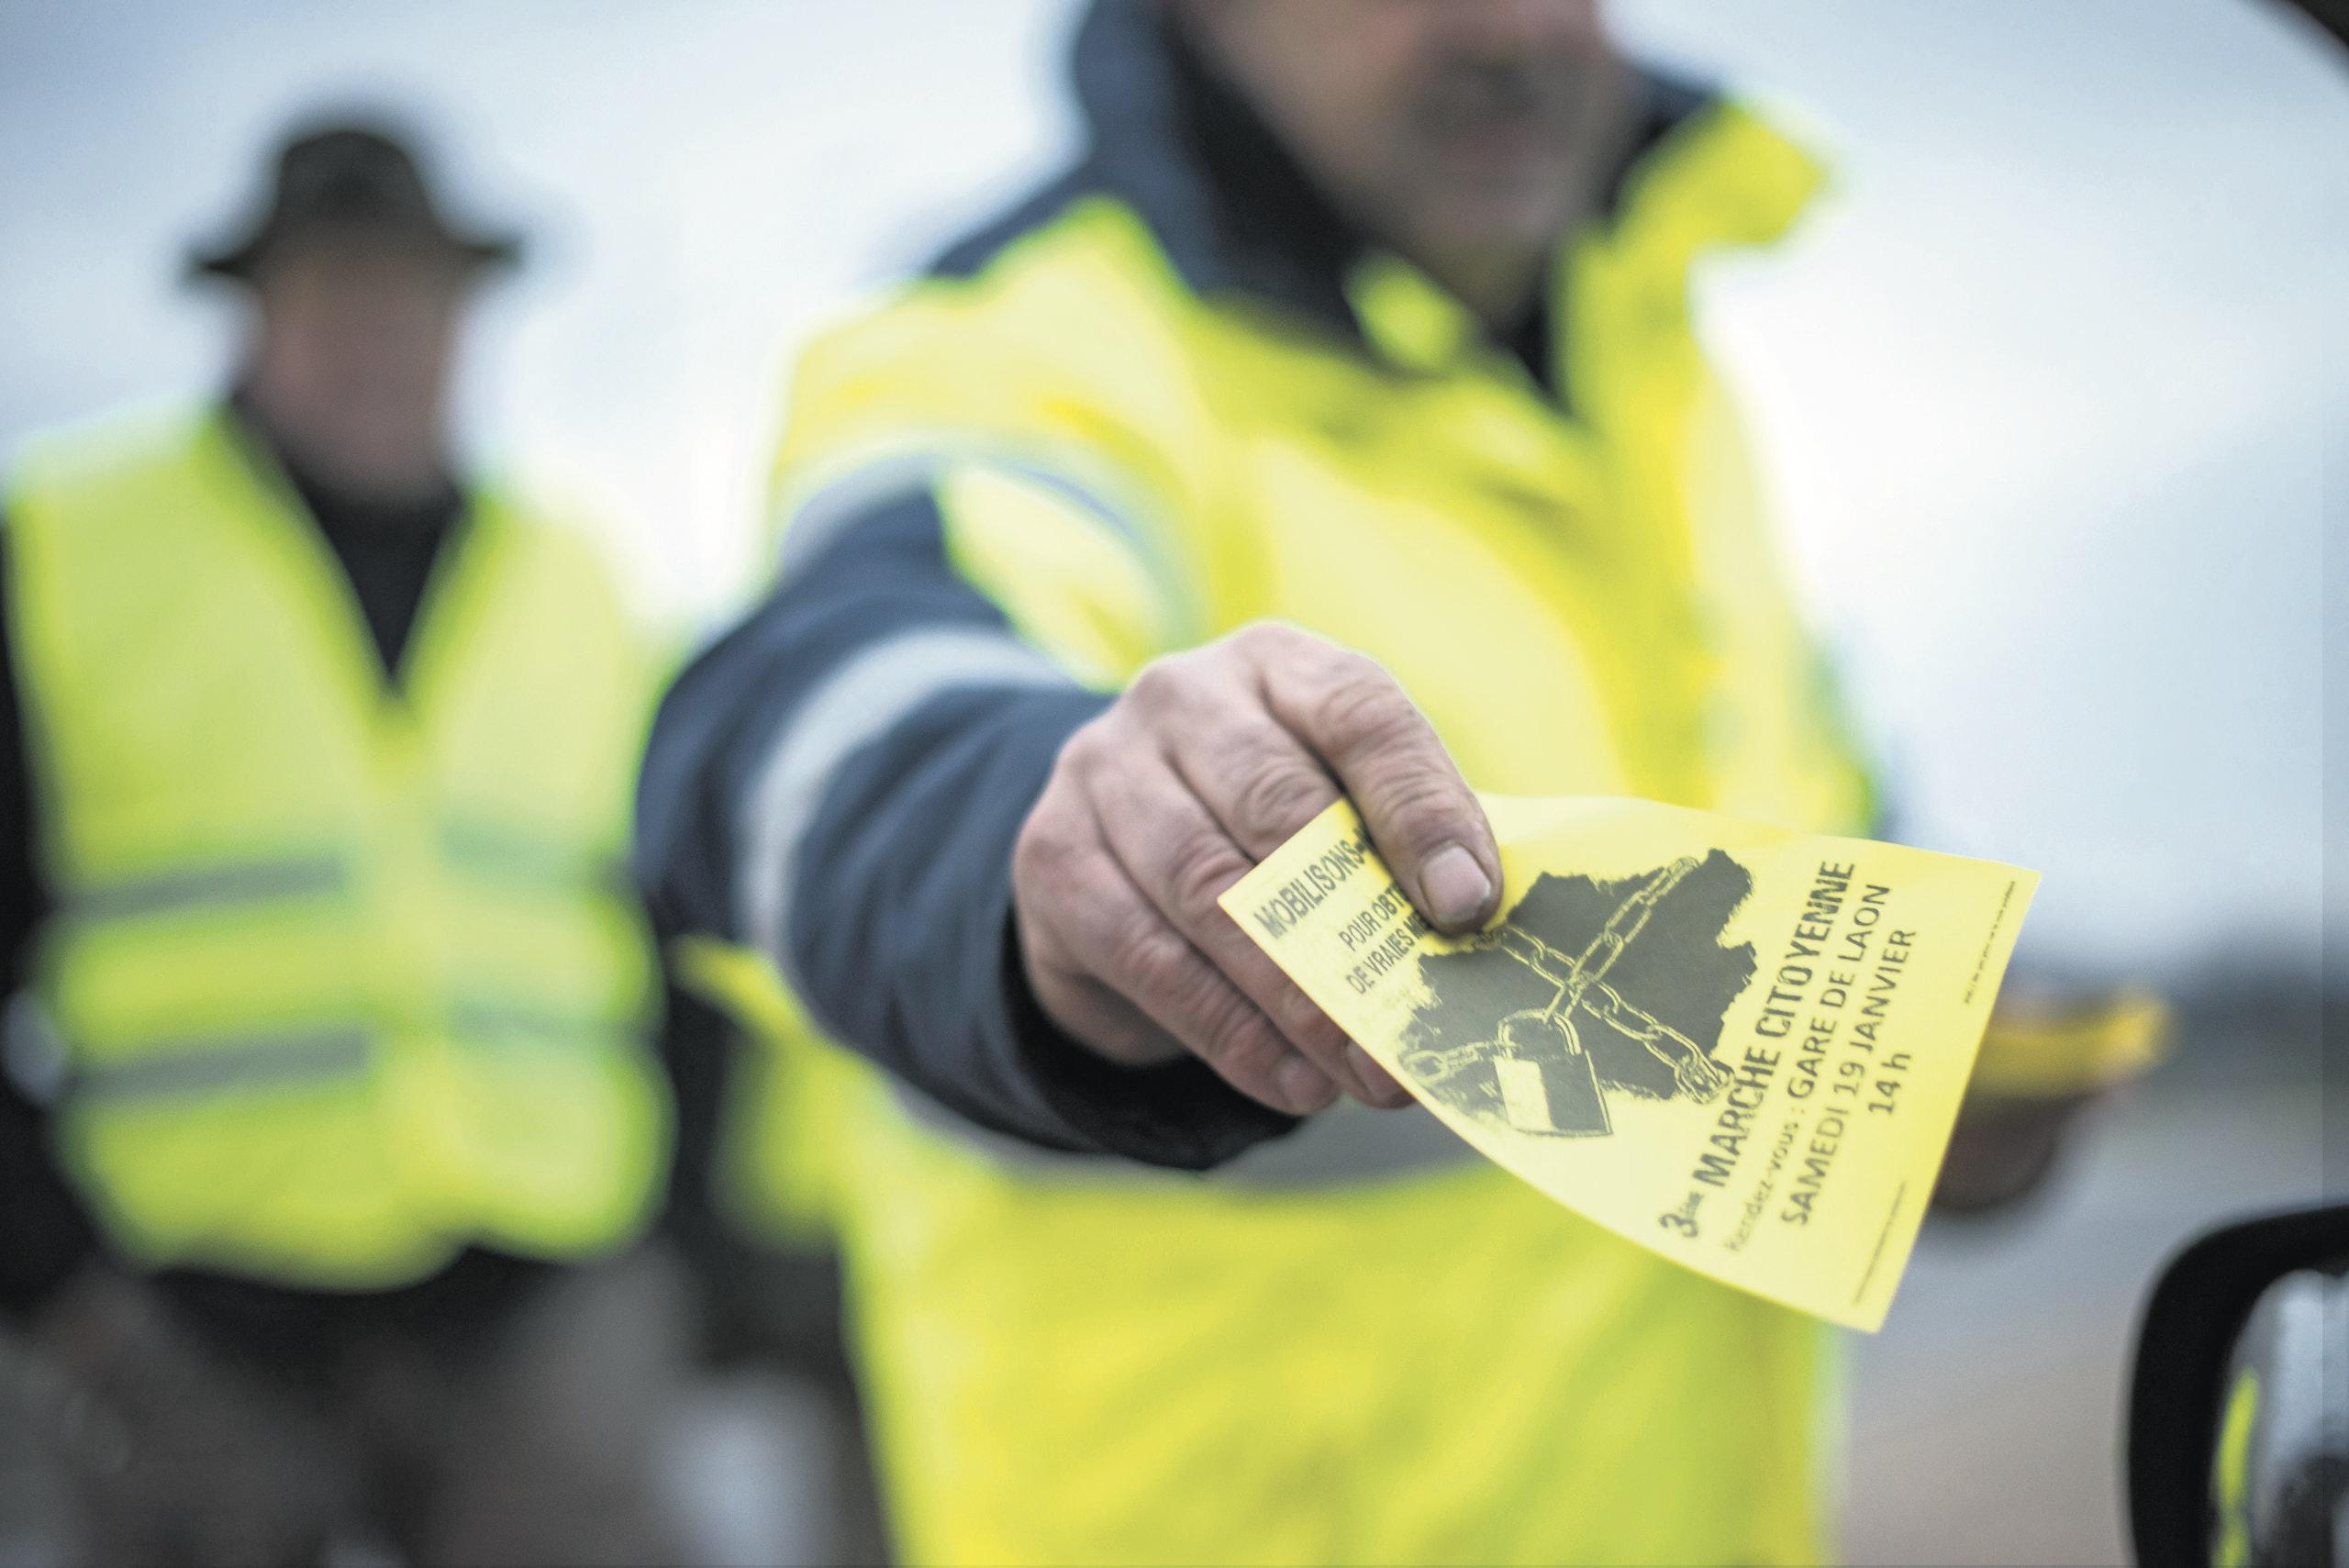 "16 januari 2019, Laon, Frankrijk. Gele Hesjes delen 's avonds flyers uit op rotonde ""Rond Point L'Europe"" en veroorzaken lange files.  Foto: Steven Wassenaar"